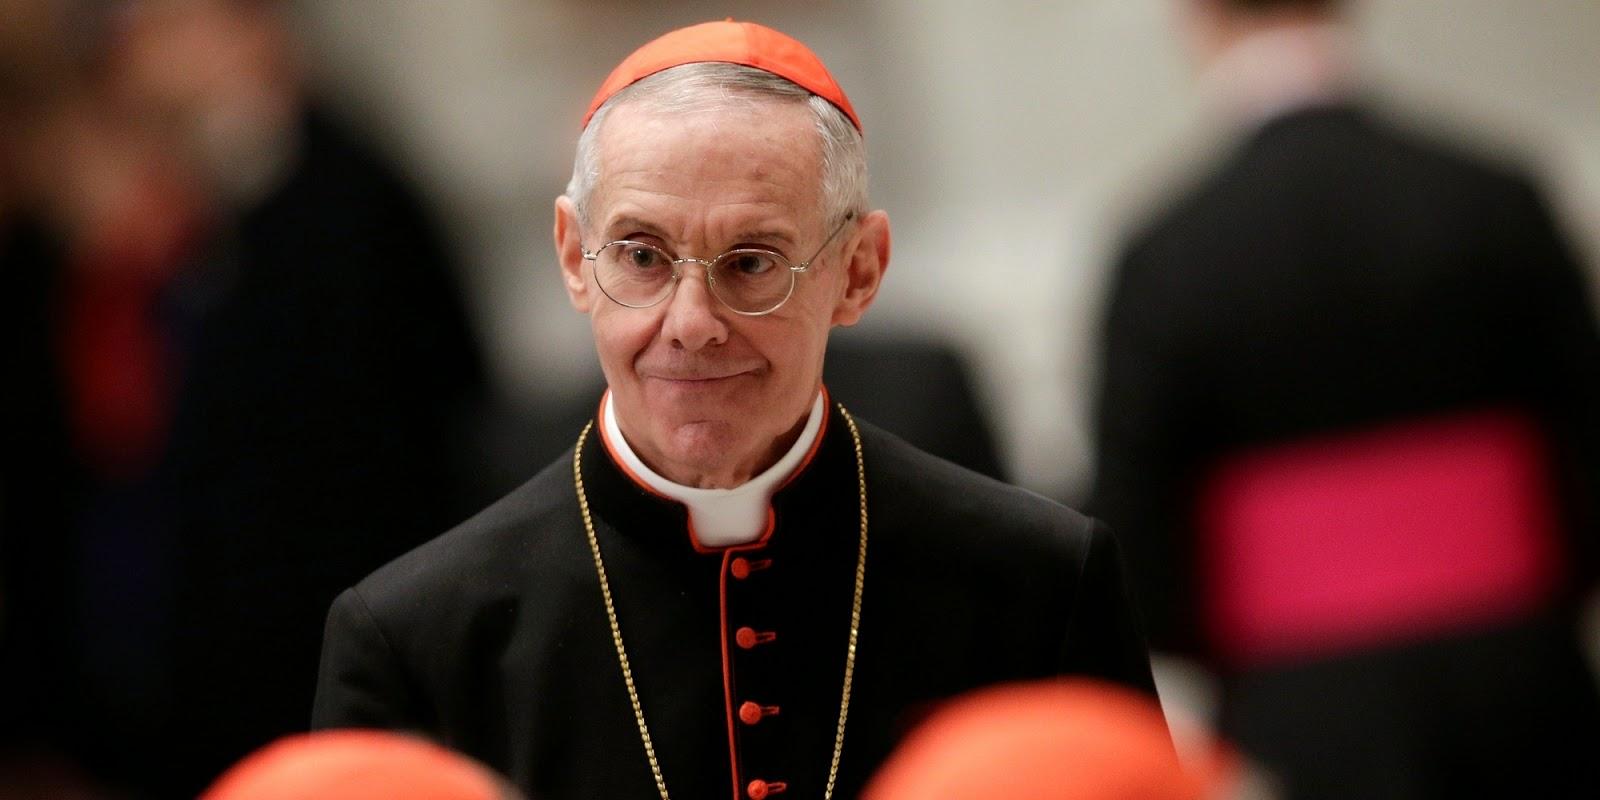 Matrimonio Catolico Resumen : Verdad en libertad linchamiento a matrimonio catÓlico